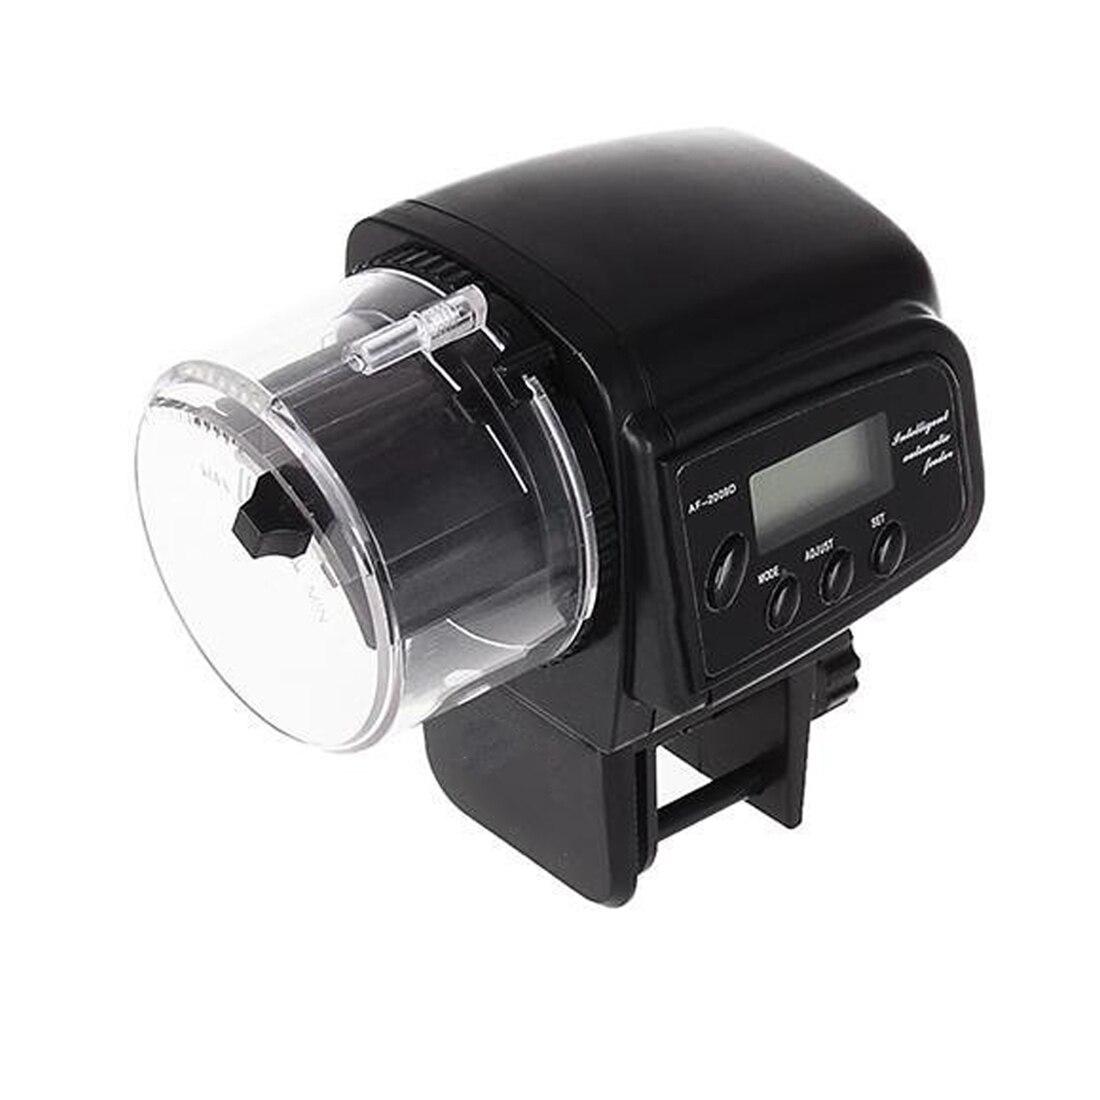 Aquarium fish tank auto food feeder lcd timer - New Aquarium Fish Tank Food Feeder Timer Lcd Display Automatic Manual Feeding Convenient